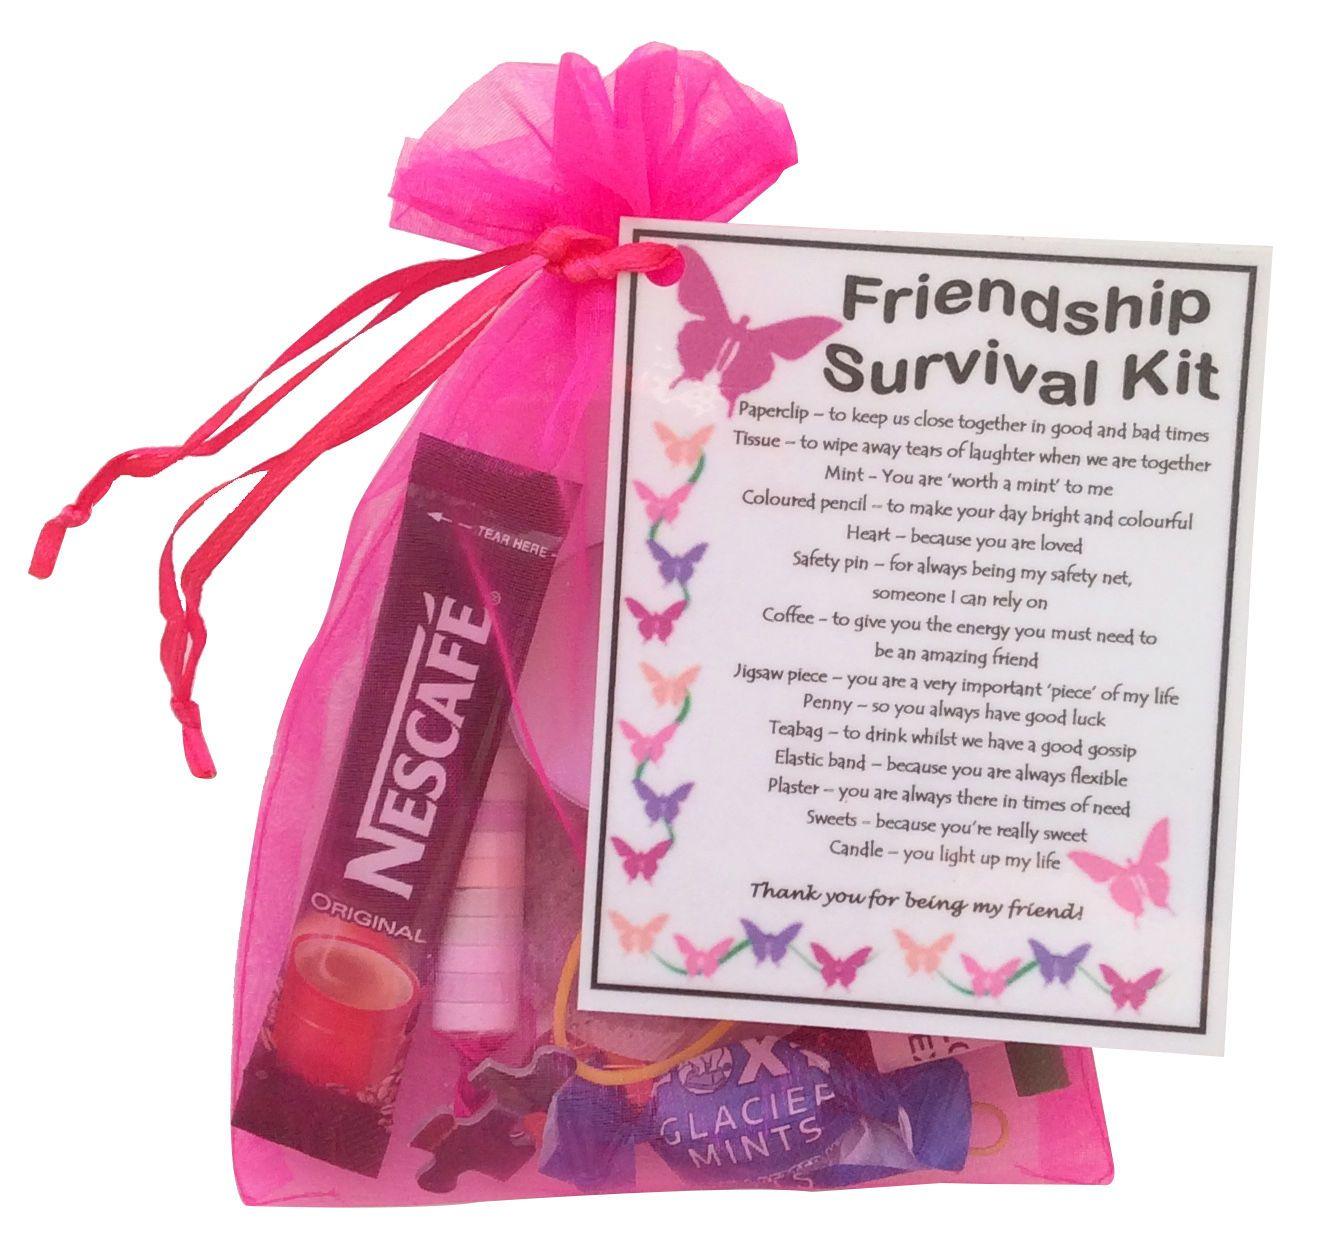 Details about Friendship /BFF / Best Friend Survival kit